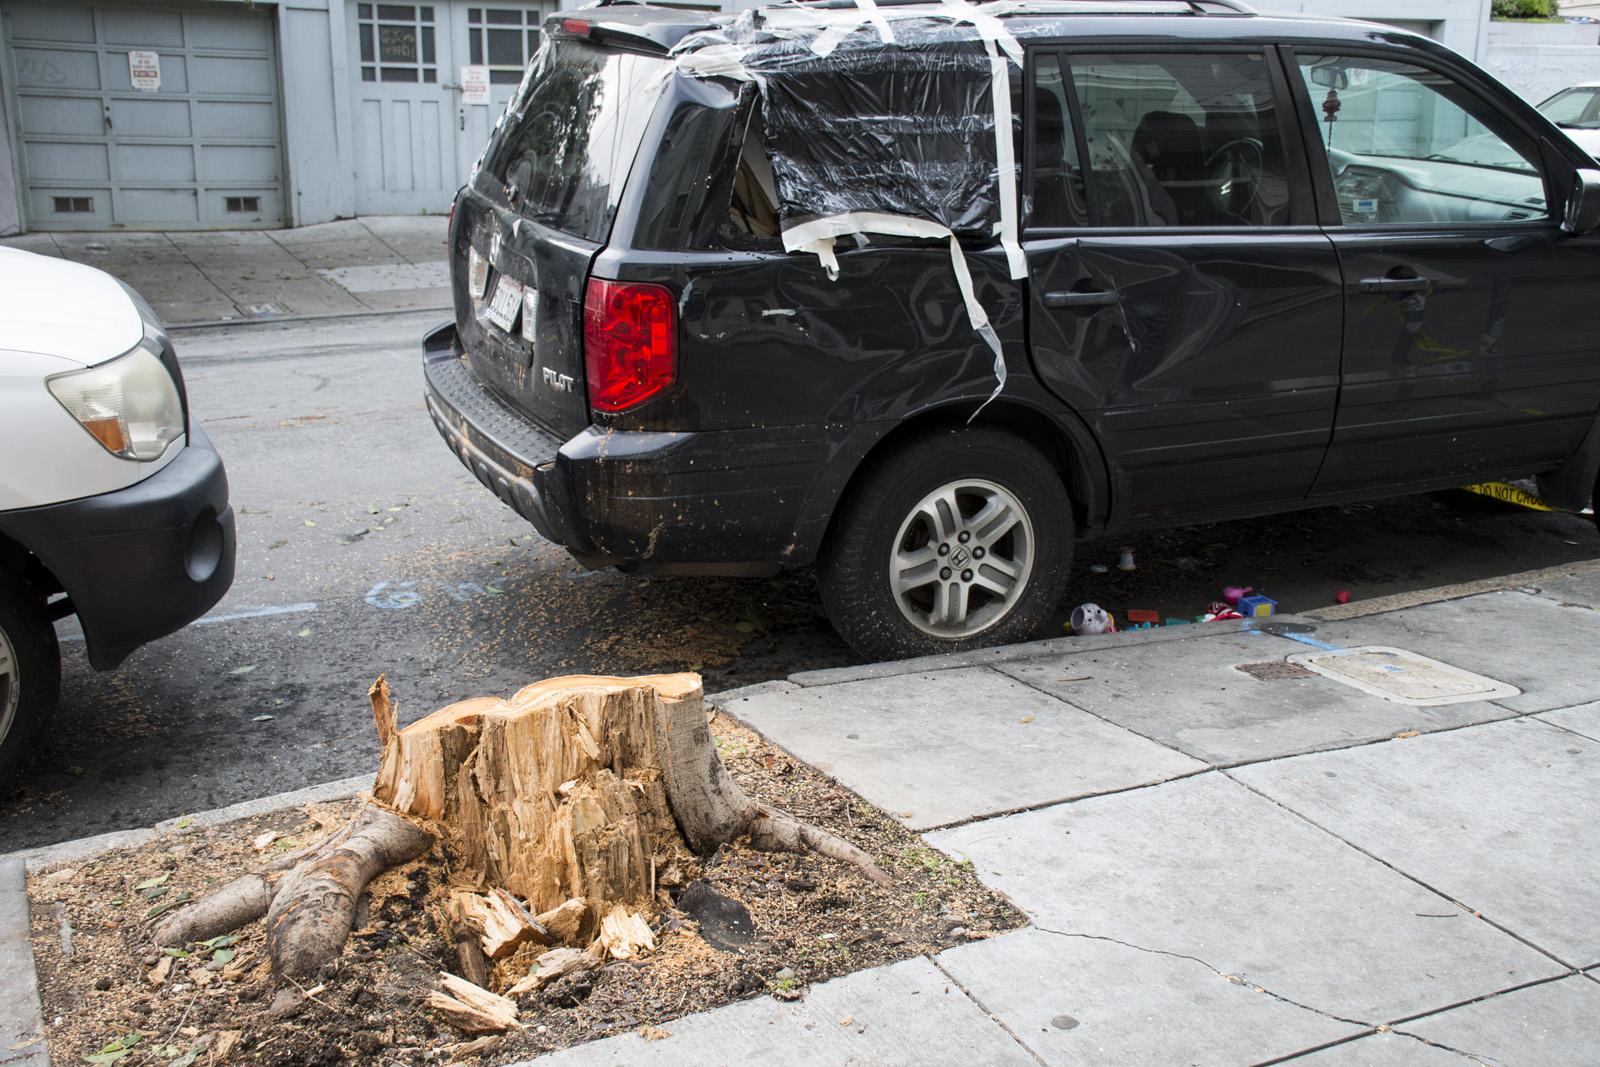 Where a tree fell onto a car. Photo by Lola M. Chavez